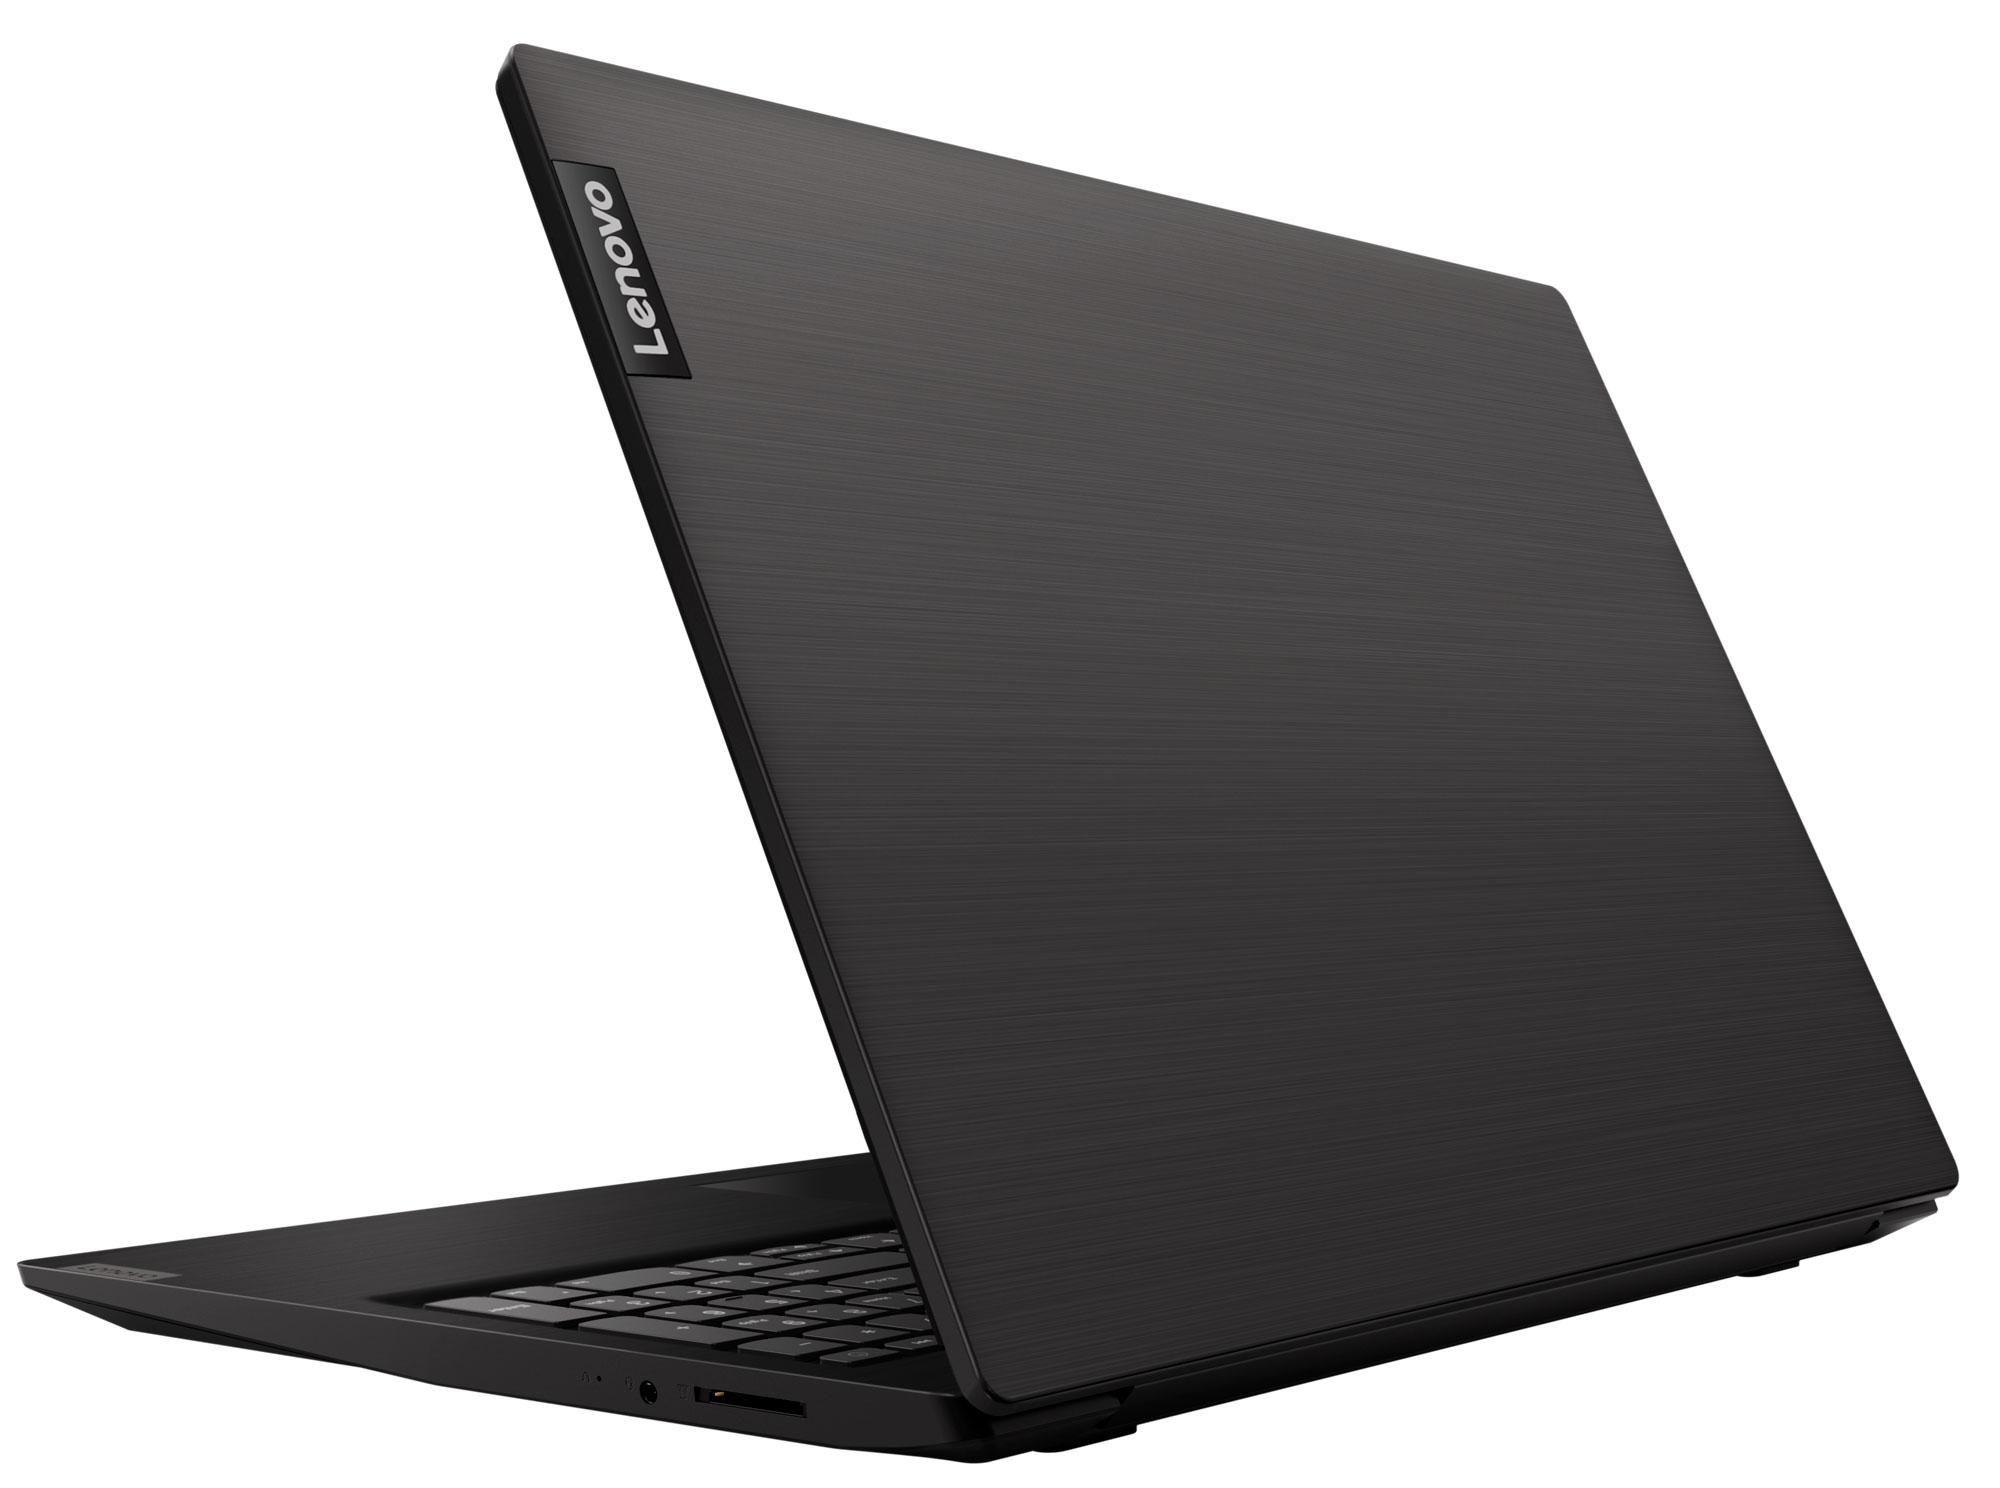 Фото  Ноутбук Lenovo ideapad S145-15AST Black (81N300CGRE)